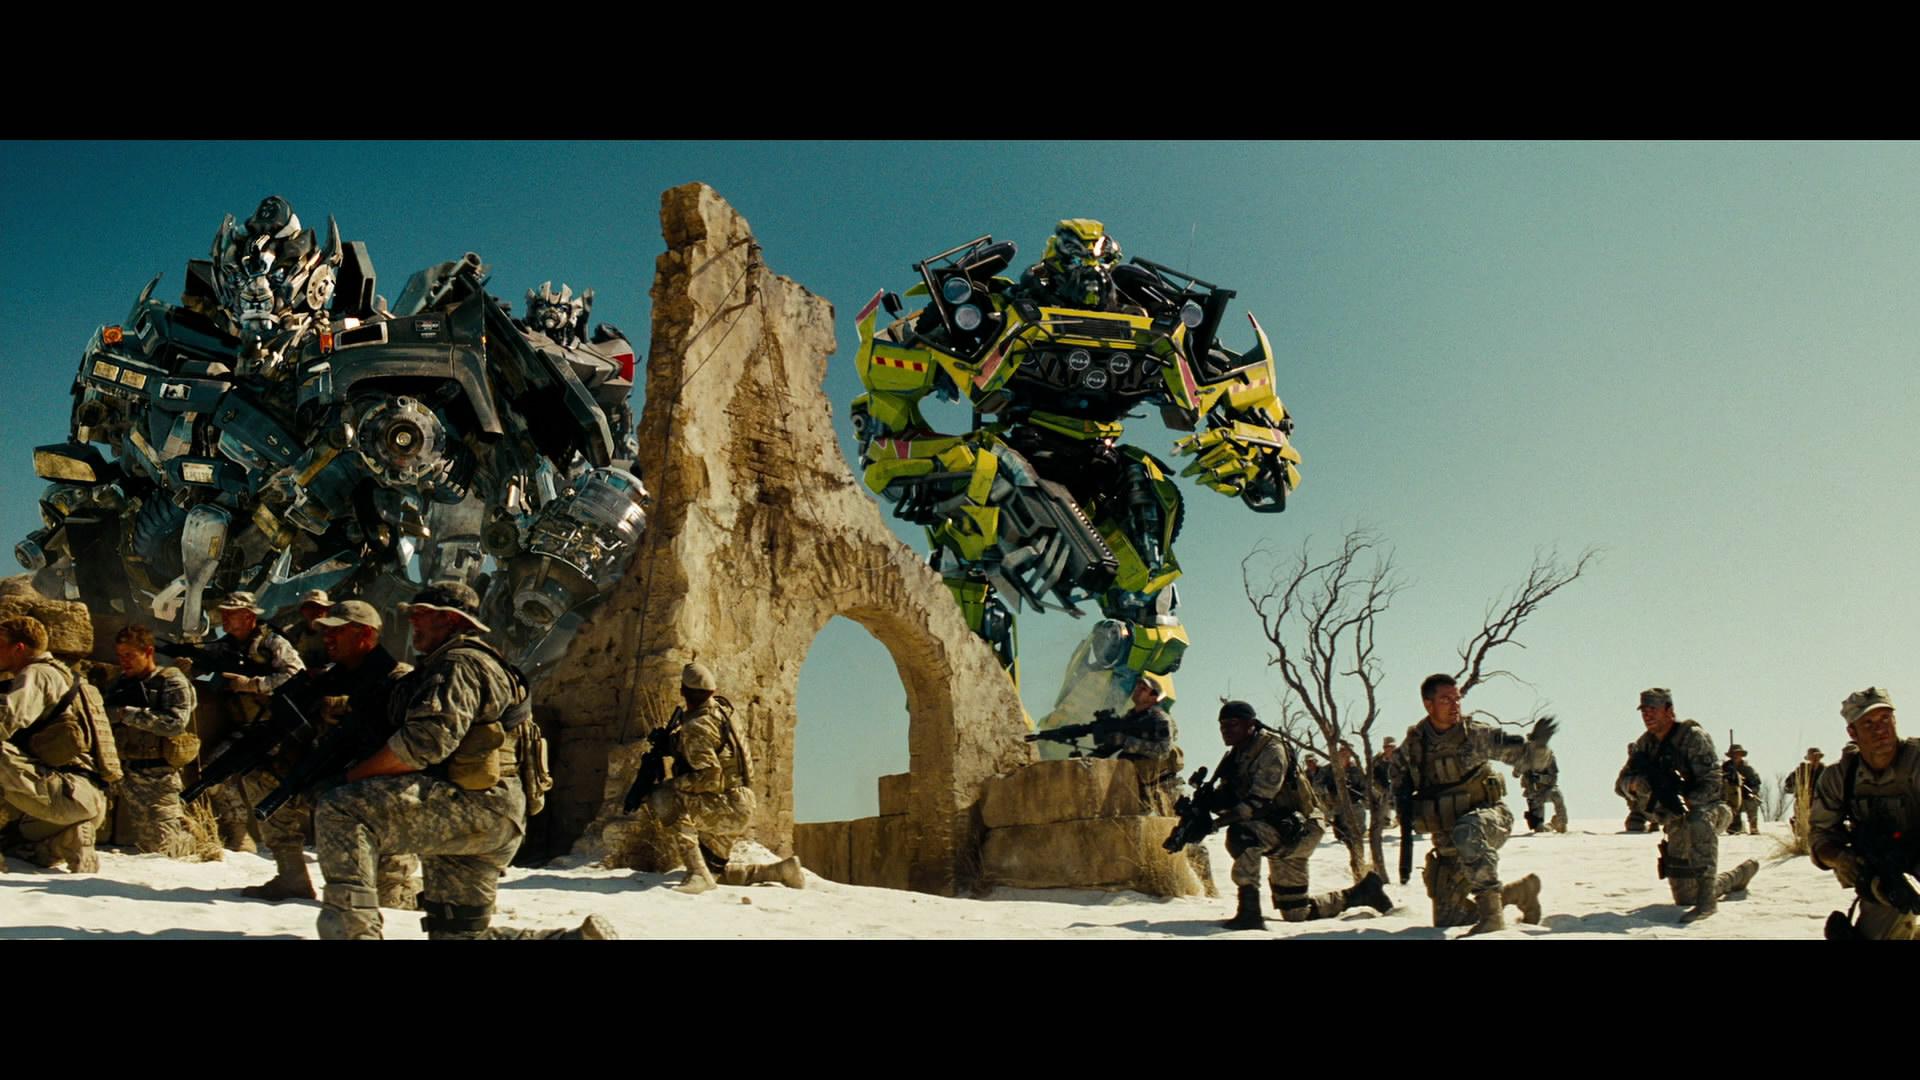 Ironhide | Transformers Film Series Wiki | FANDOM powered by Wikia